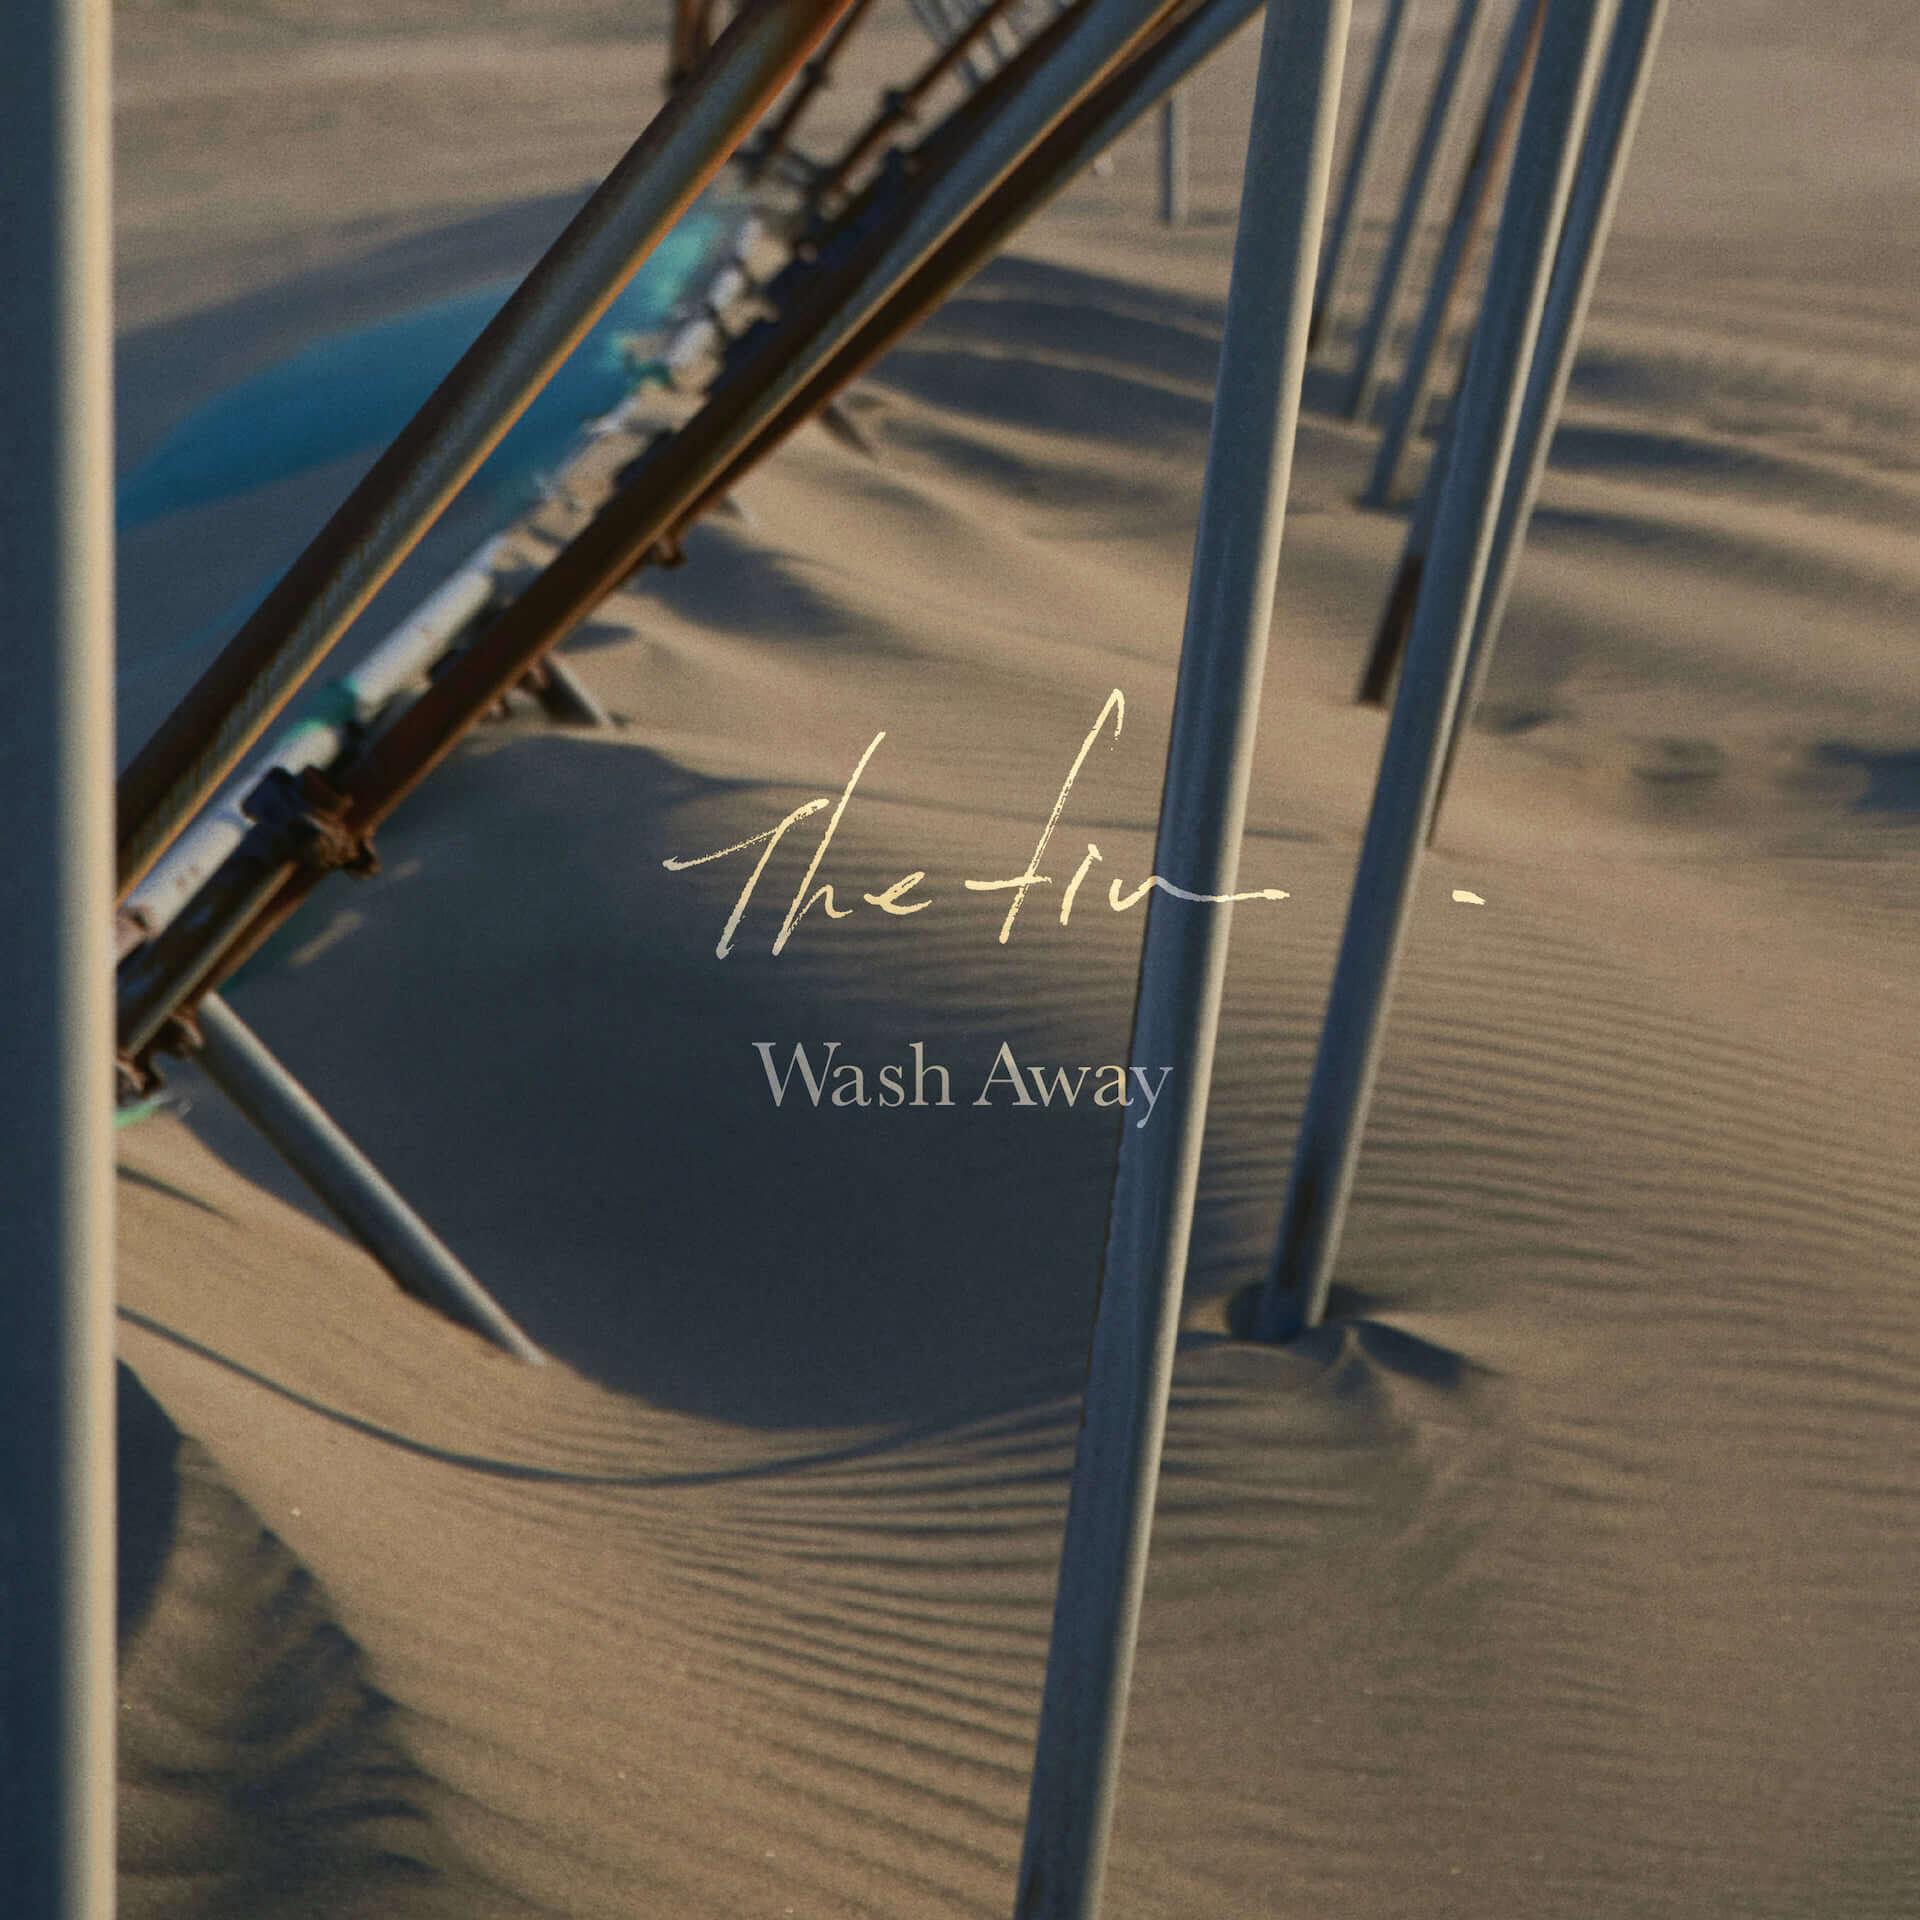 The fin. 9月13日新EP『Wash Away』リリース決定|収録曲「Gravity」先行配信&MVが本日公開 music190816thefin_8-1920x1920